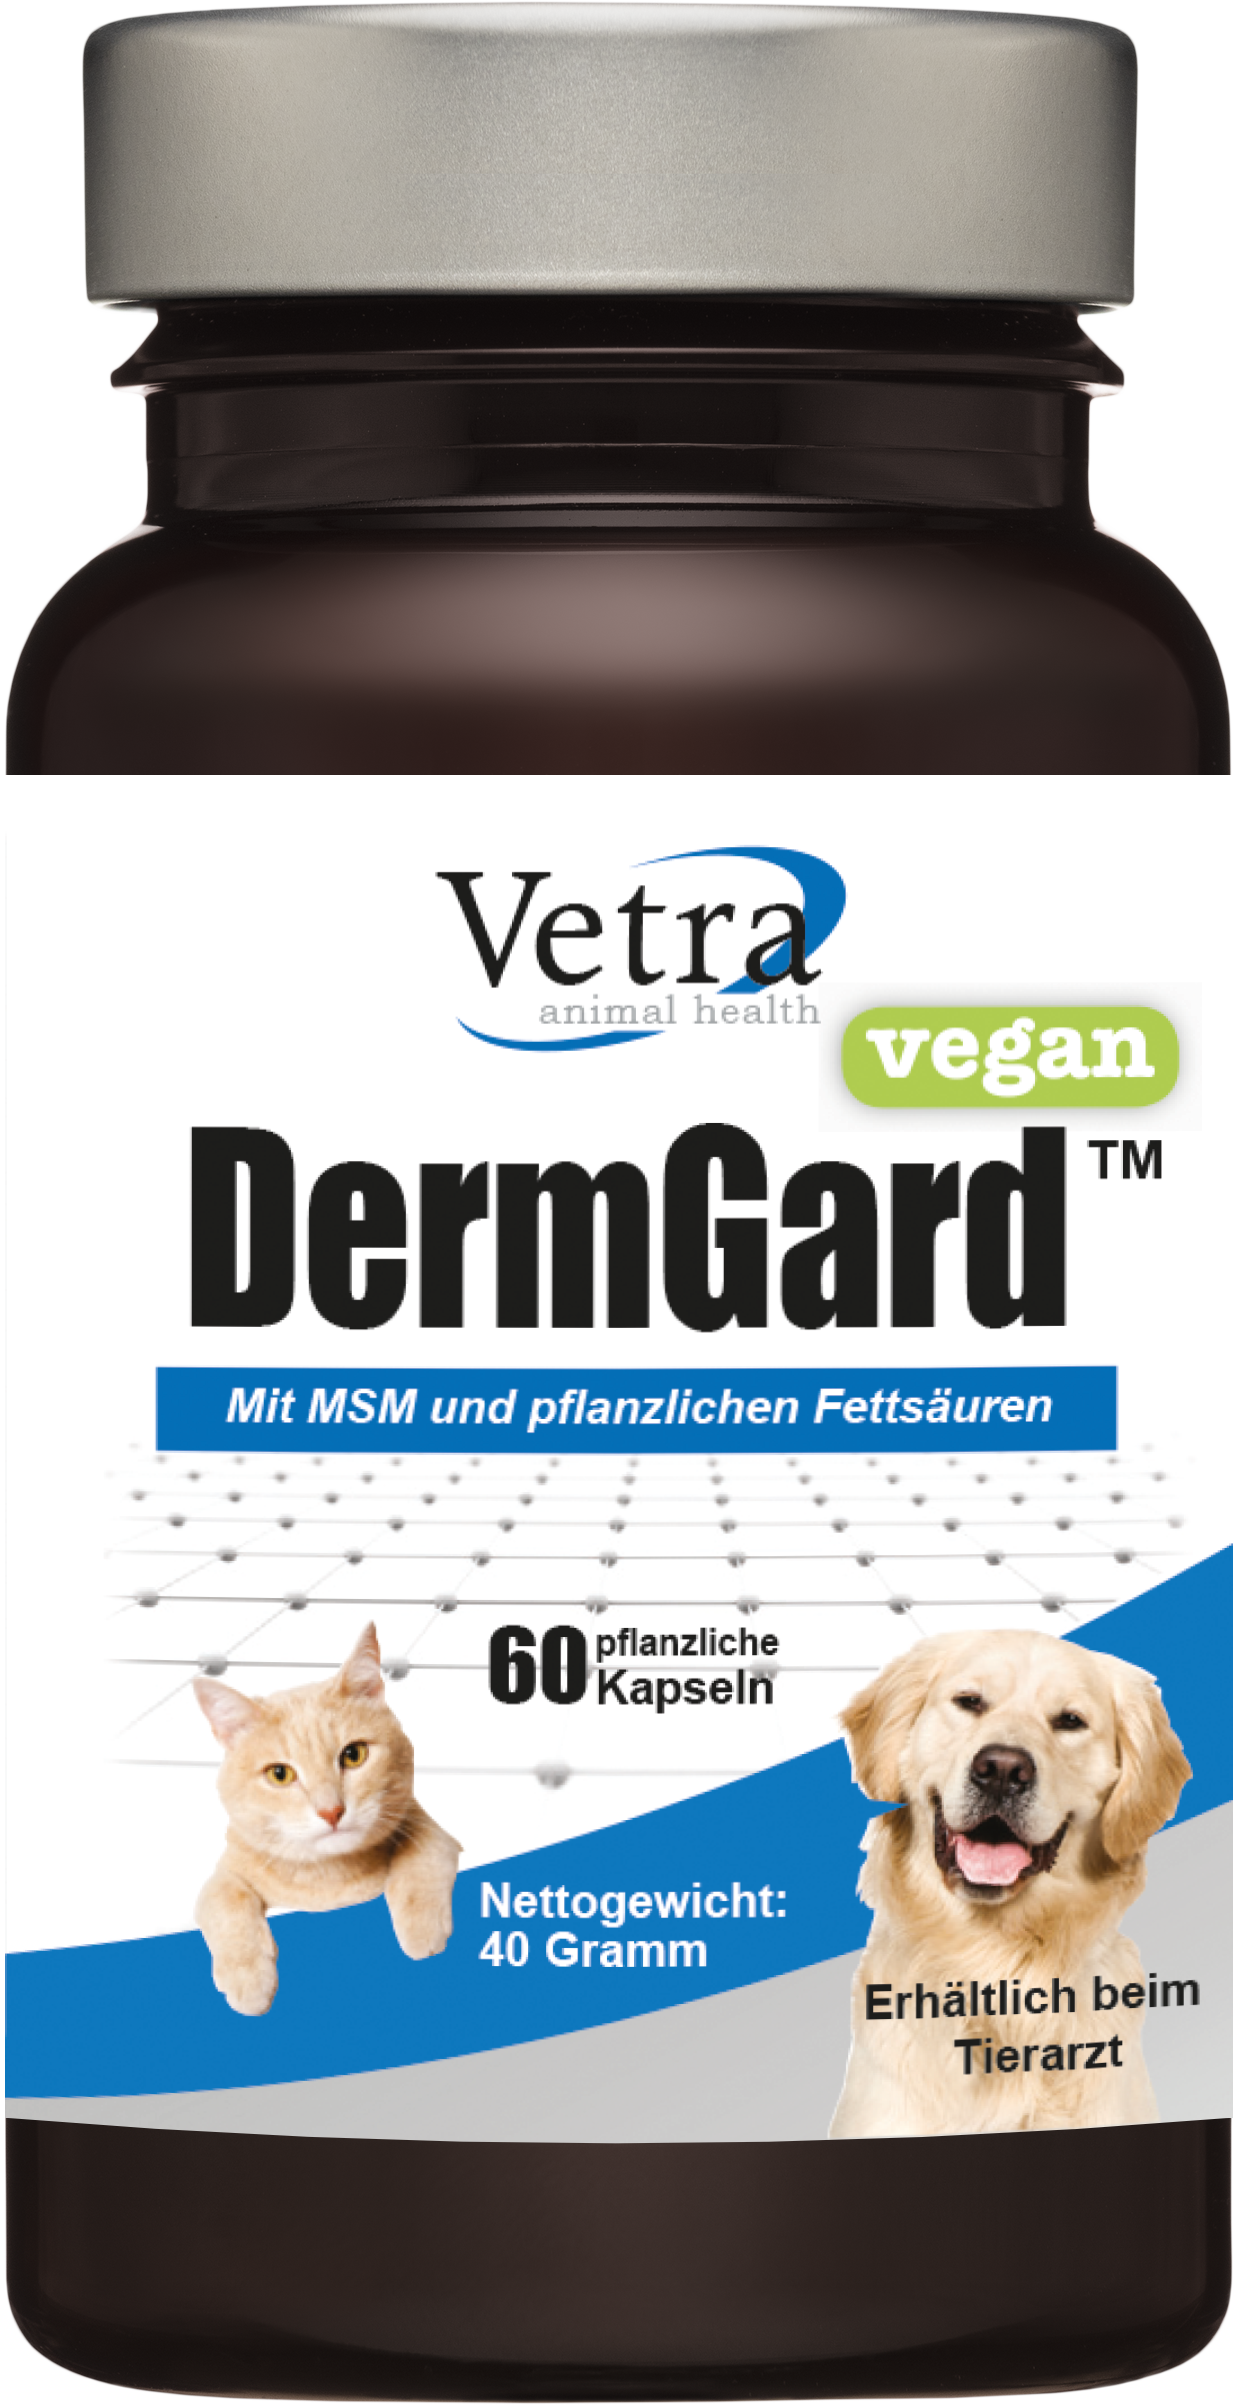 DermGard Vegan